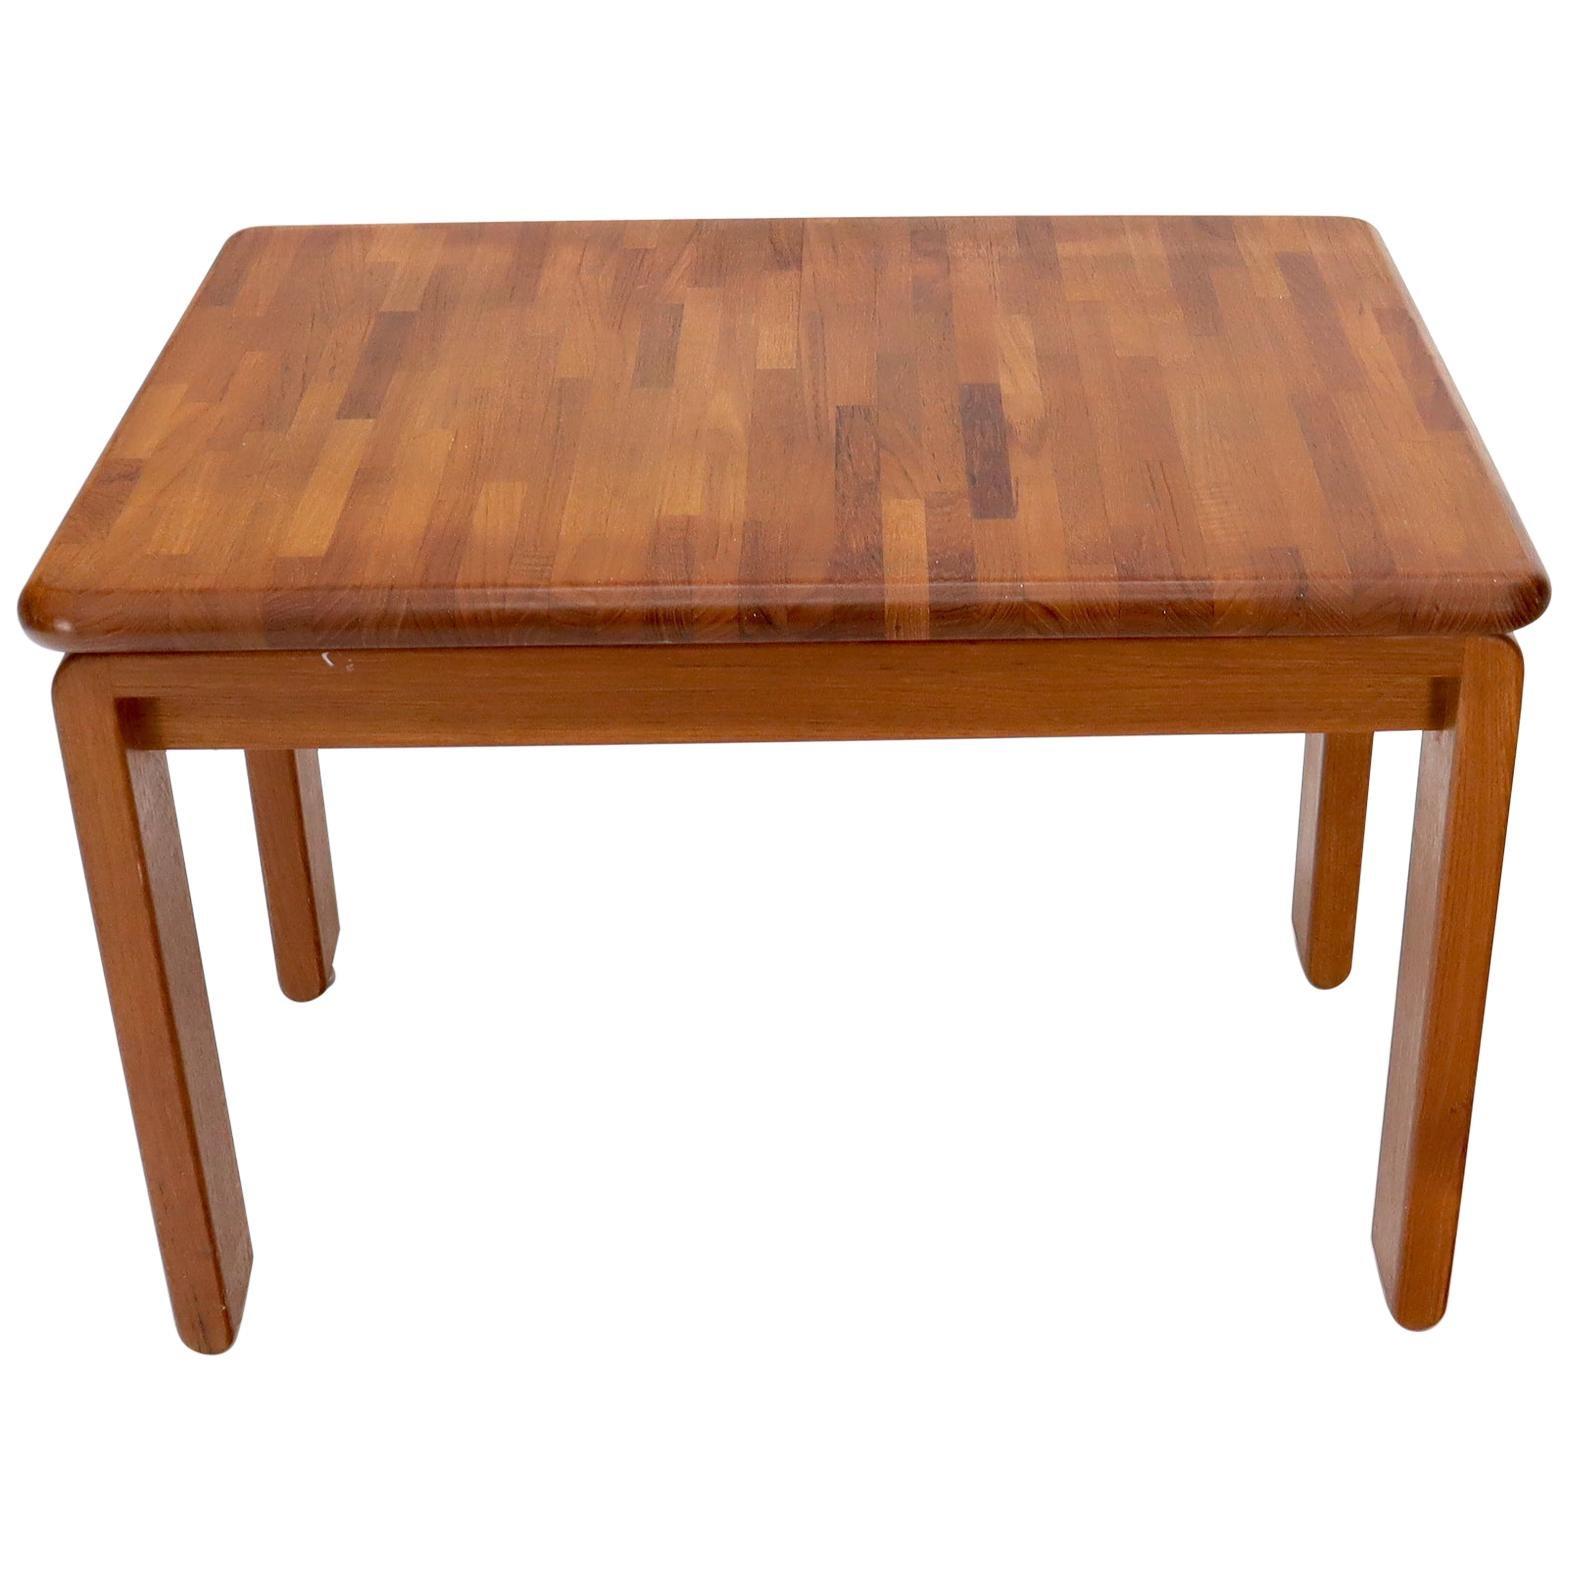 Midcentury Danish Modern Solid Teak Side End Table Stand